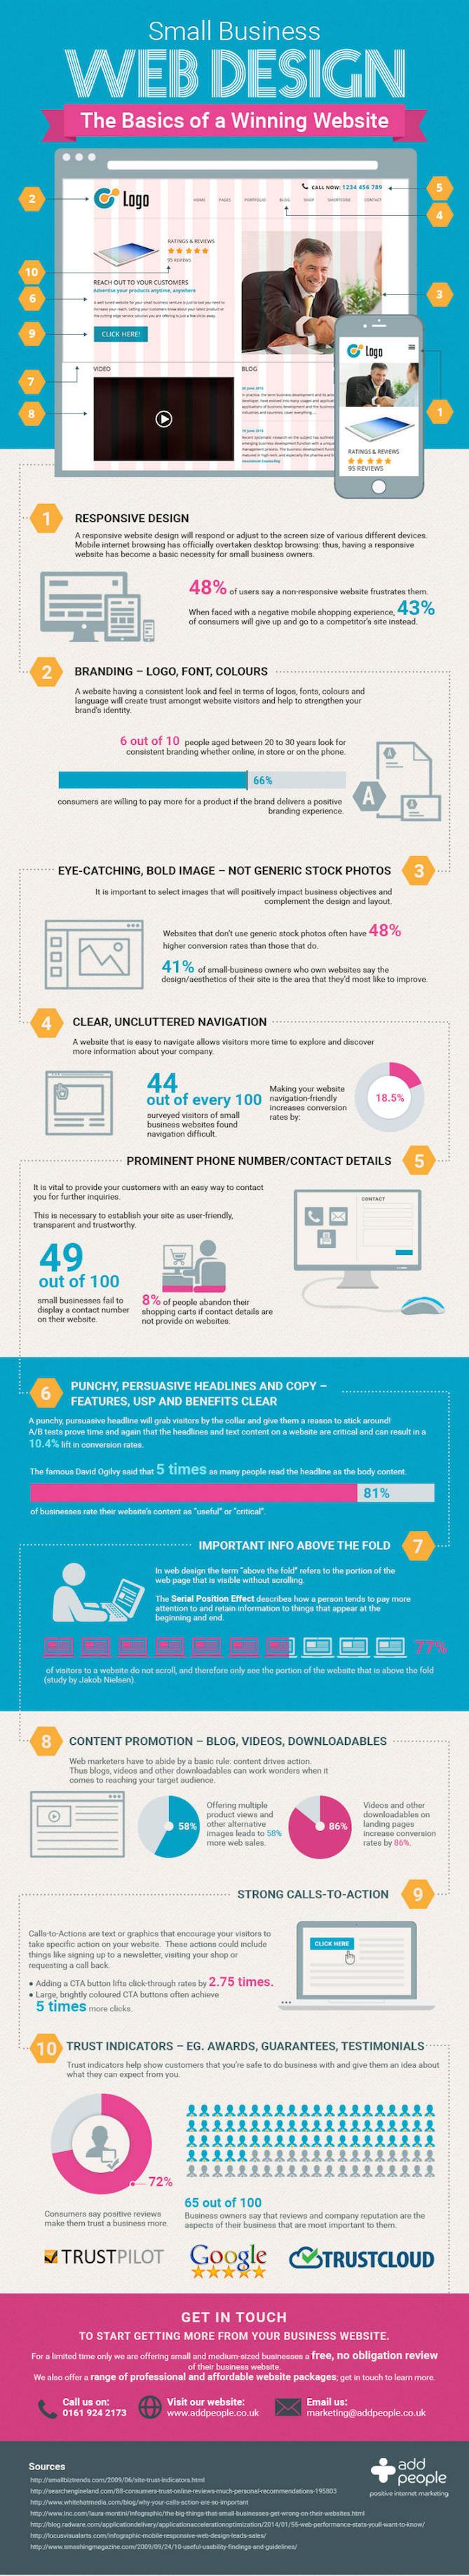 Website Design Santa Barbara Infographic